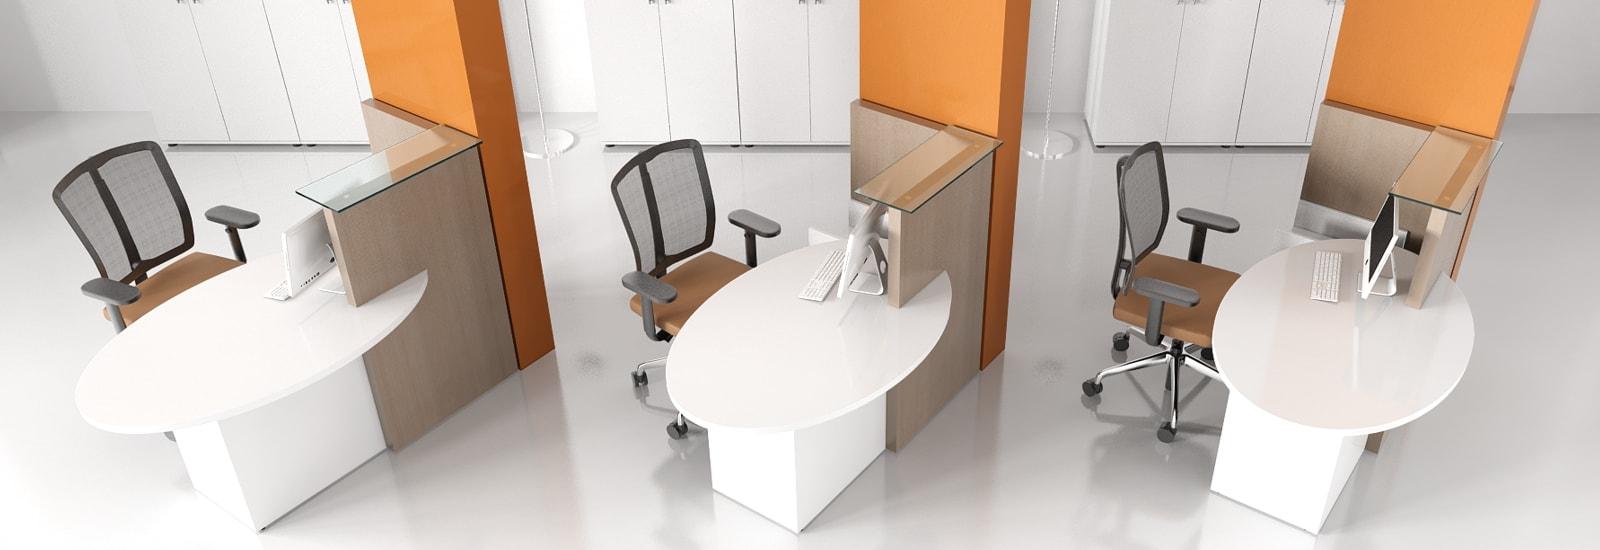 Office Desks Supplier North Wales